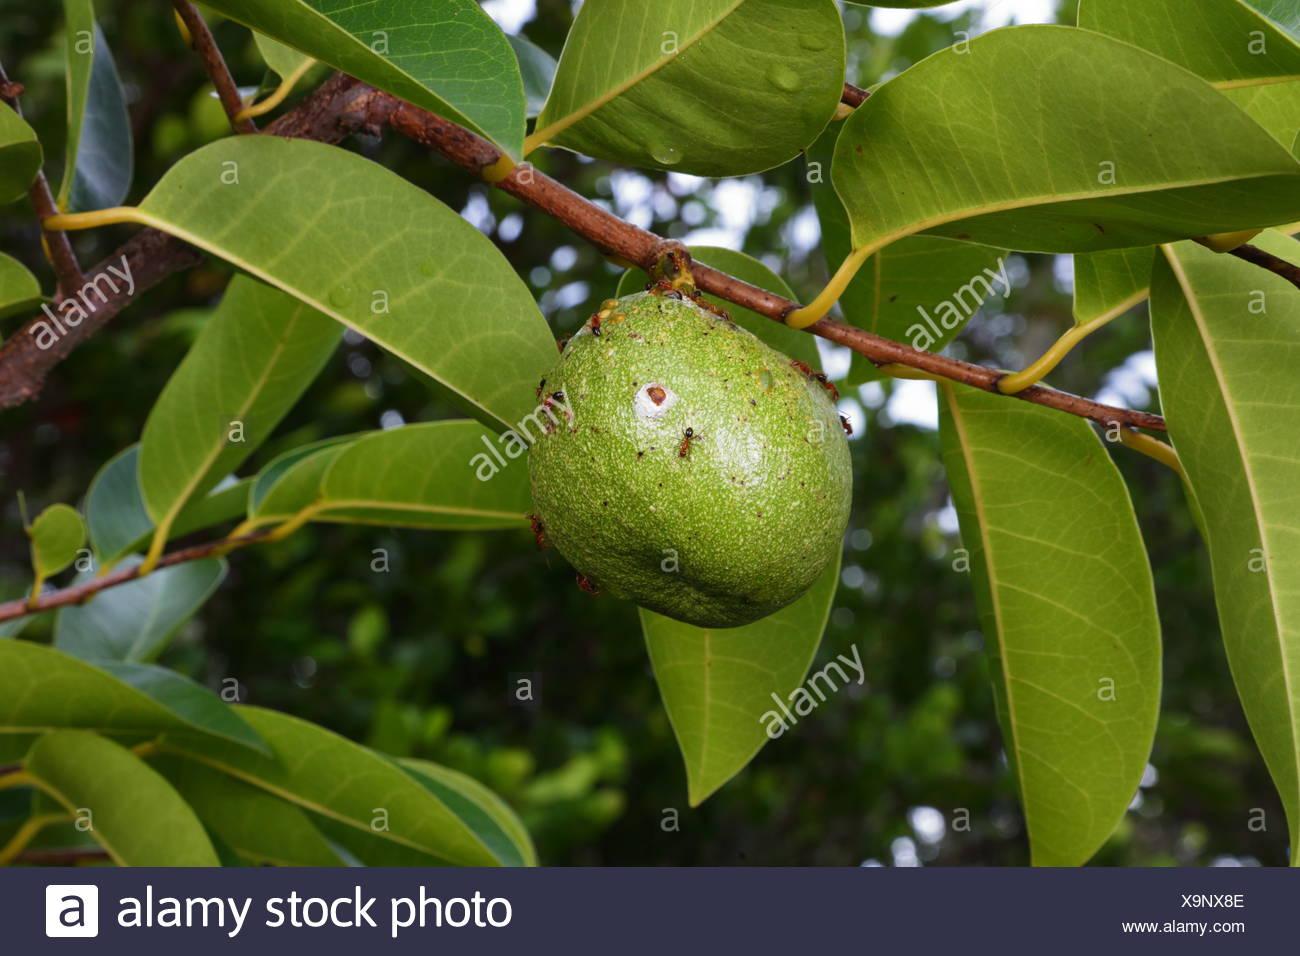 A pond apple or alligator apple, Annona glabra. - Stock Image